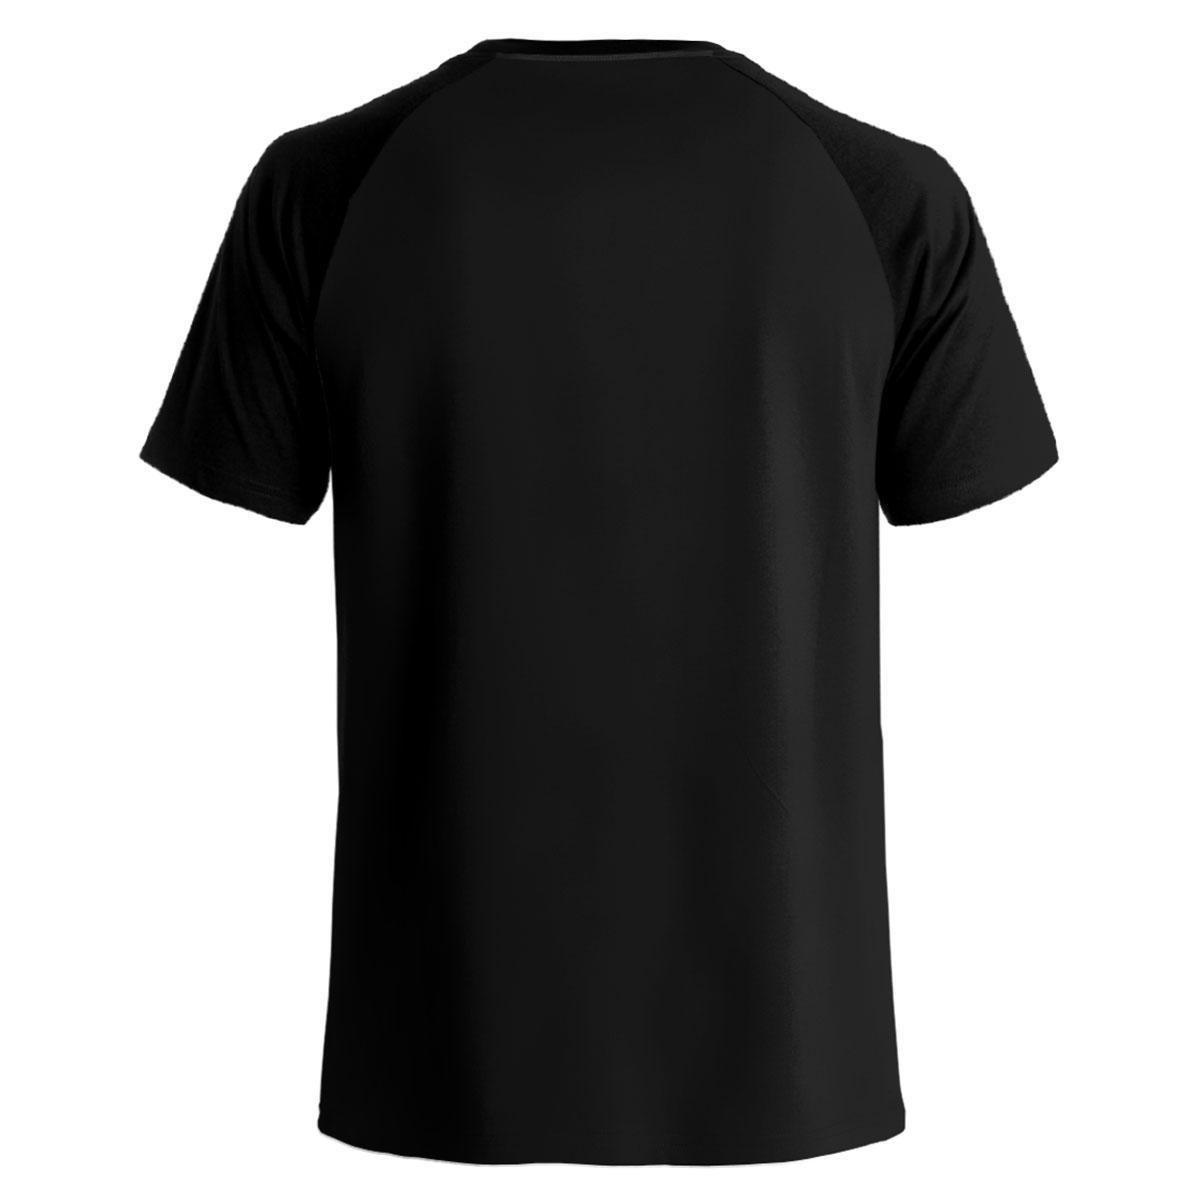 Camiseta Stompy Raglan Modelo 60 Masculina - Preto